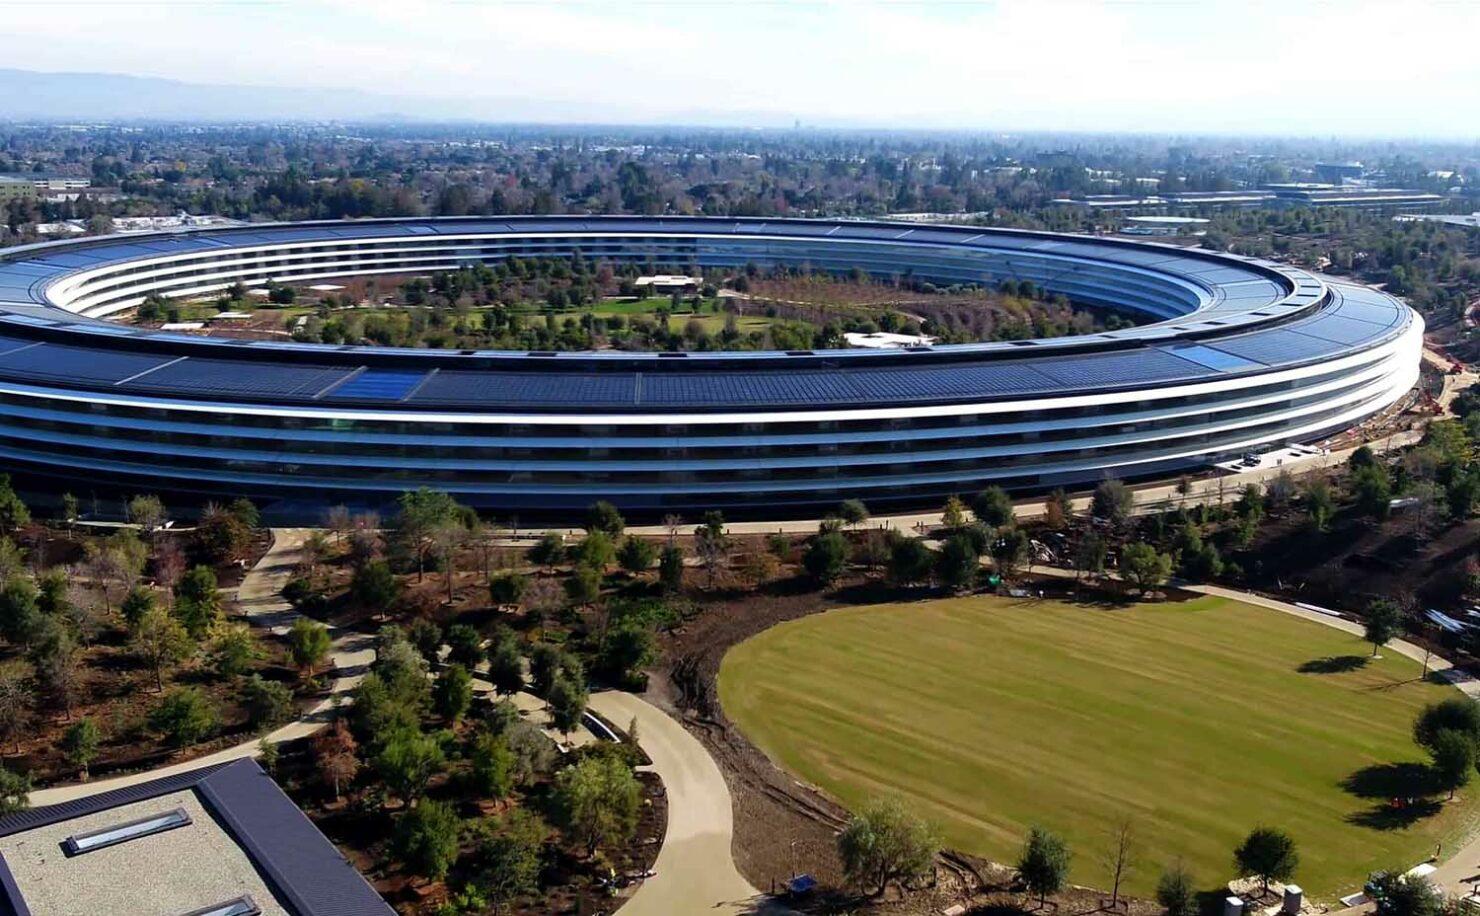 Apple Reportedly Postpones March Media Event Over Coronavirus Concerns